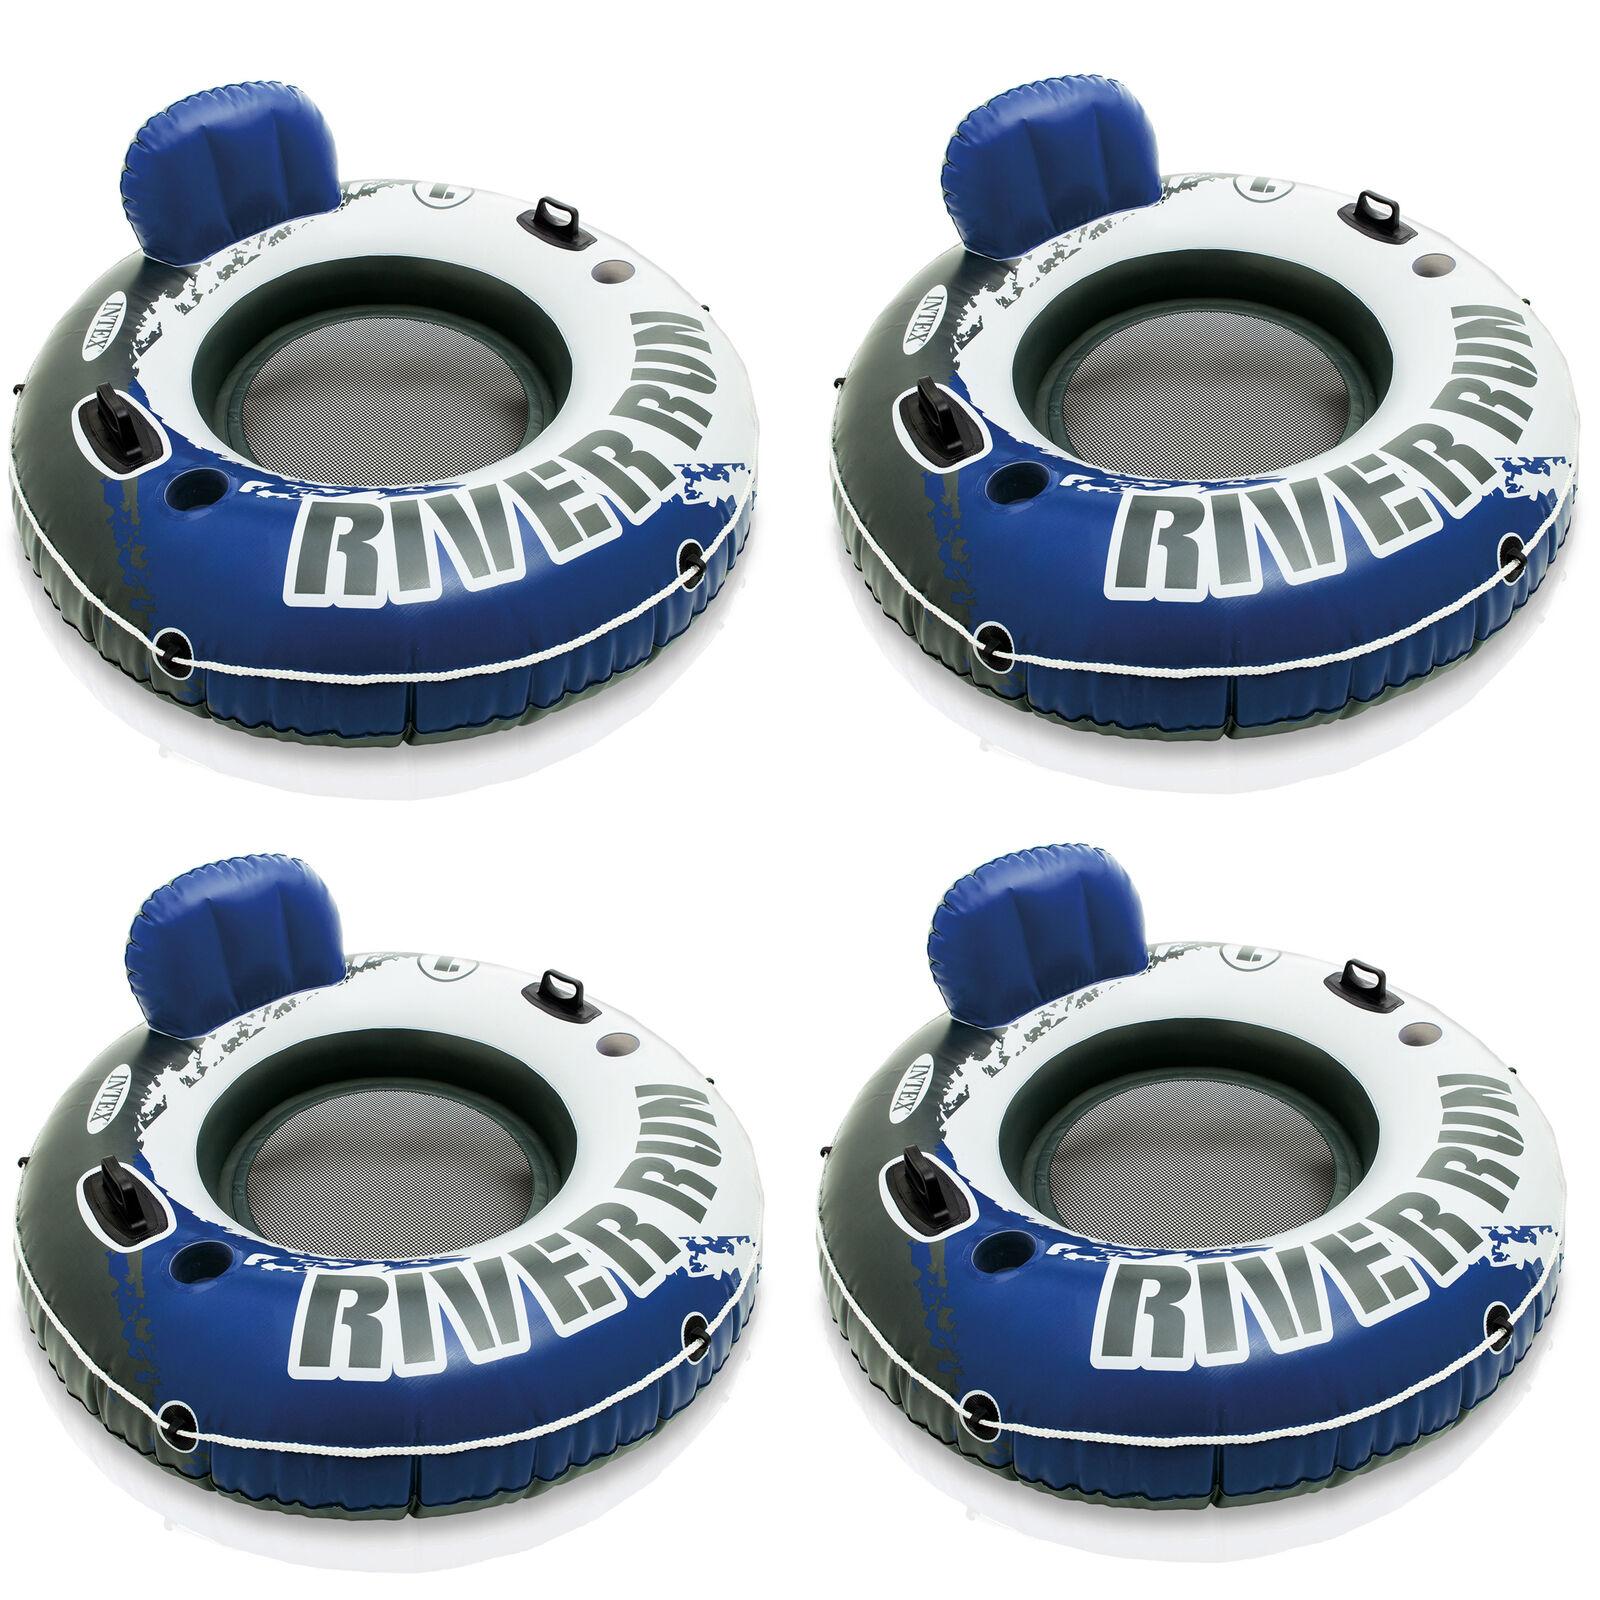 4 Intex River Run I Inflatable Water Tube Lake Floating Tubes 58825EP